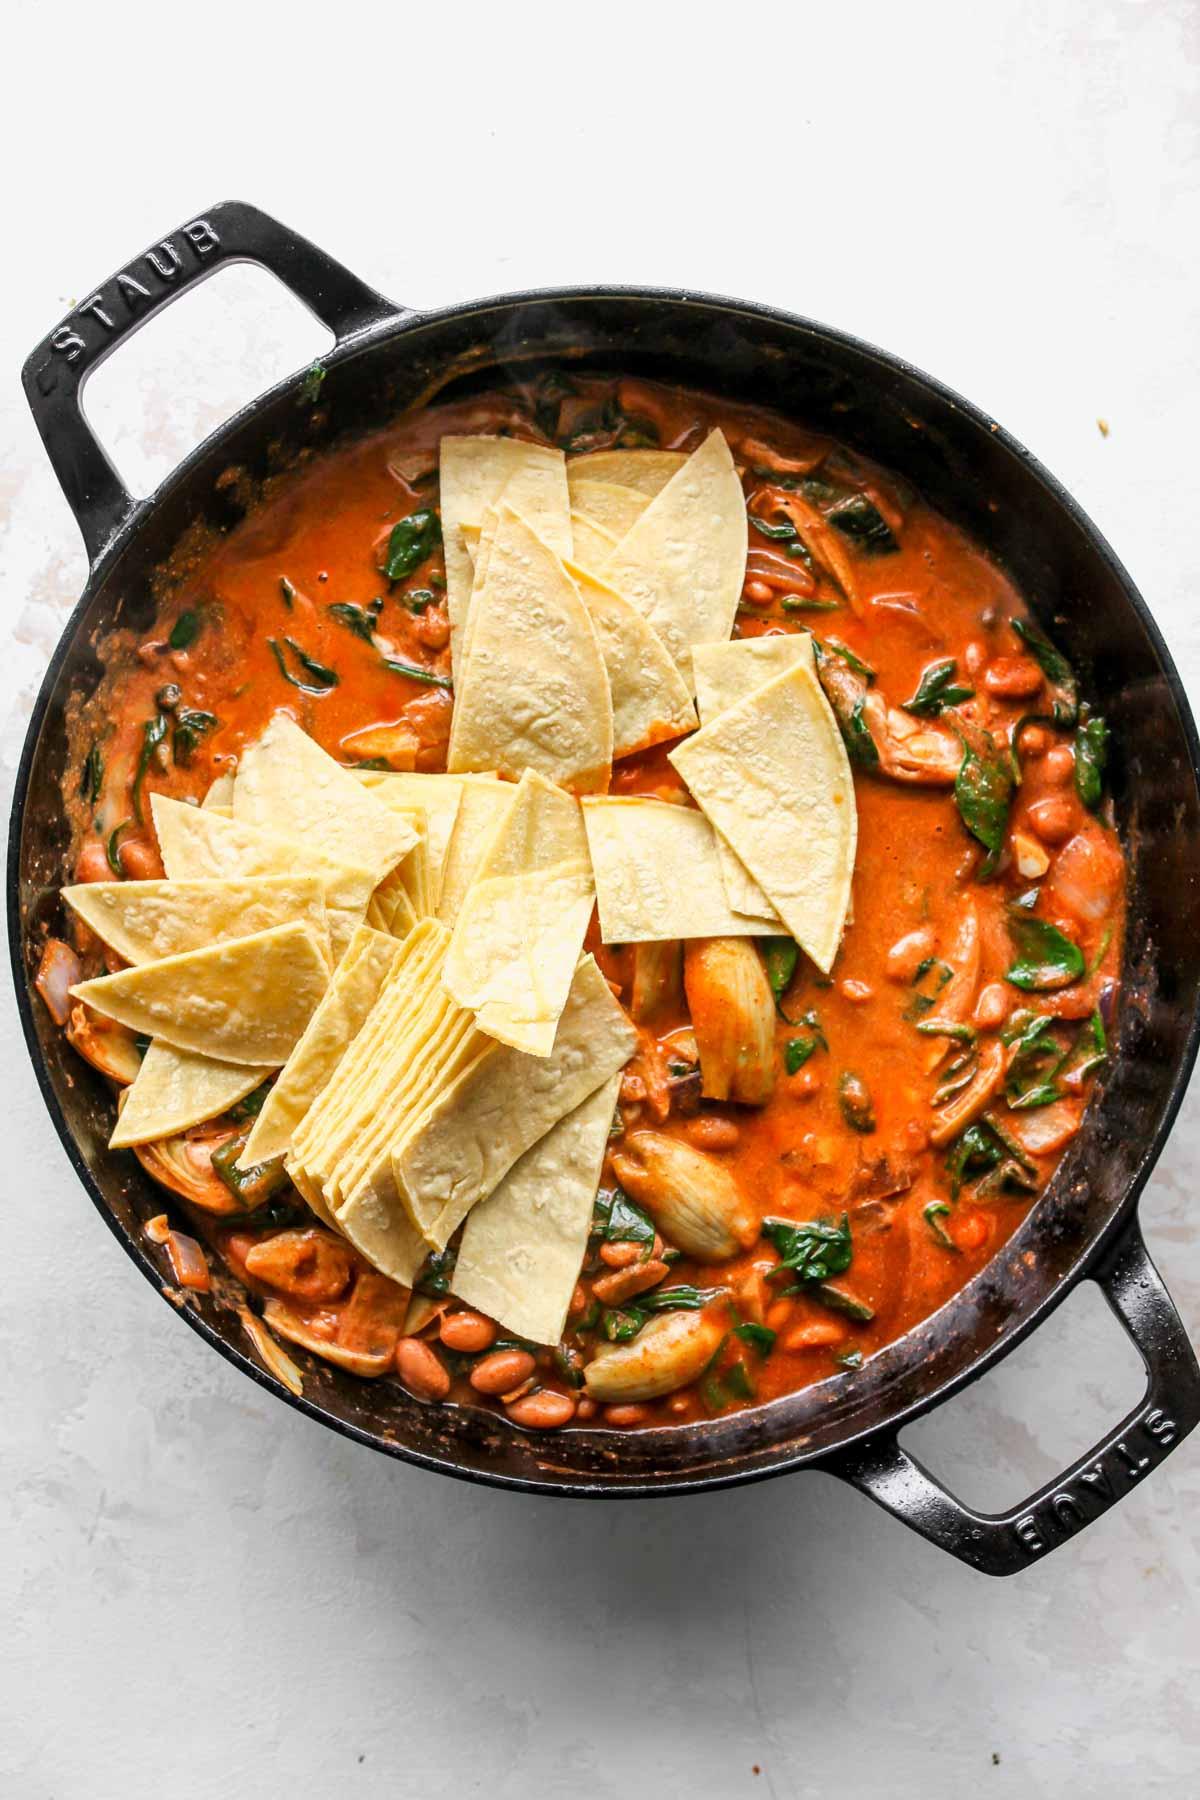 Strips of corn tortillas being mixed into a pan of enchiladas